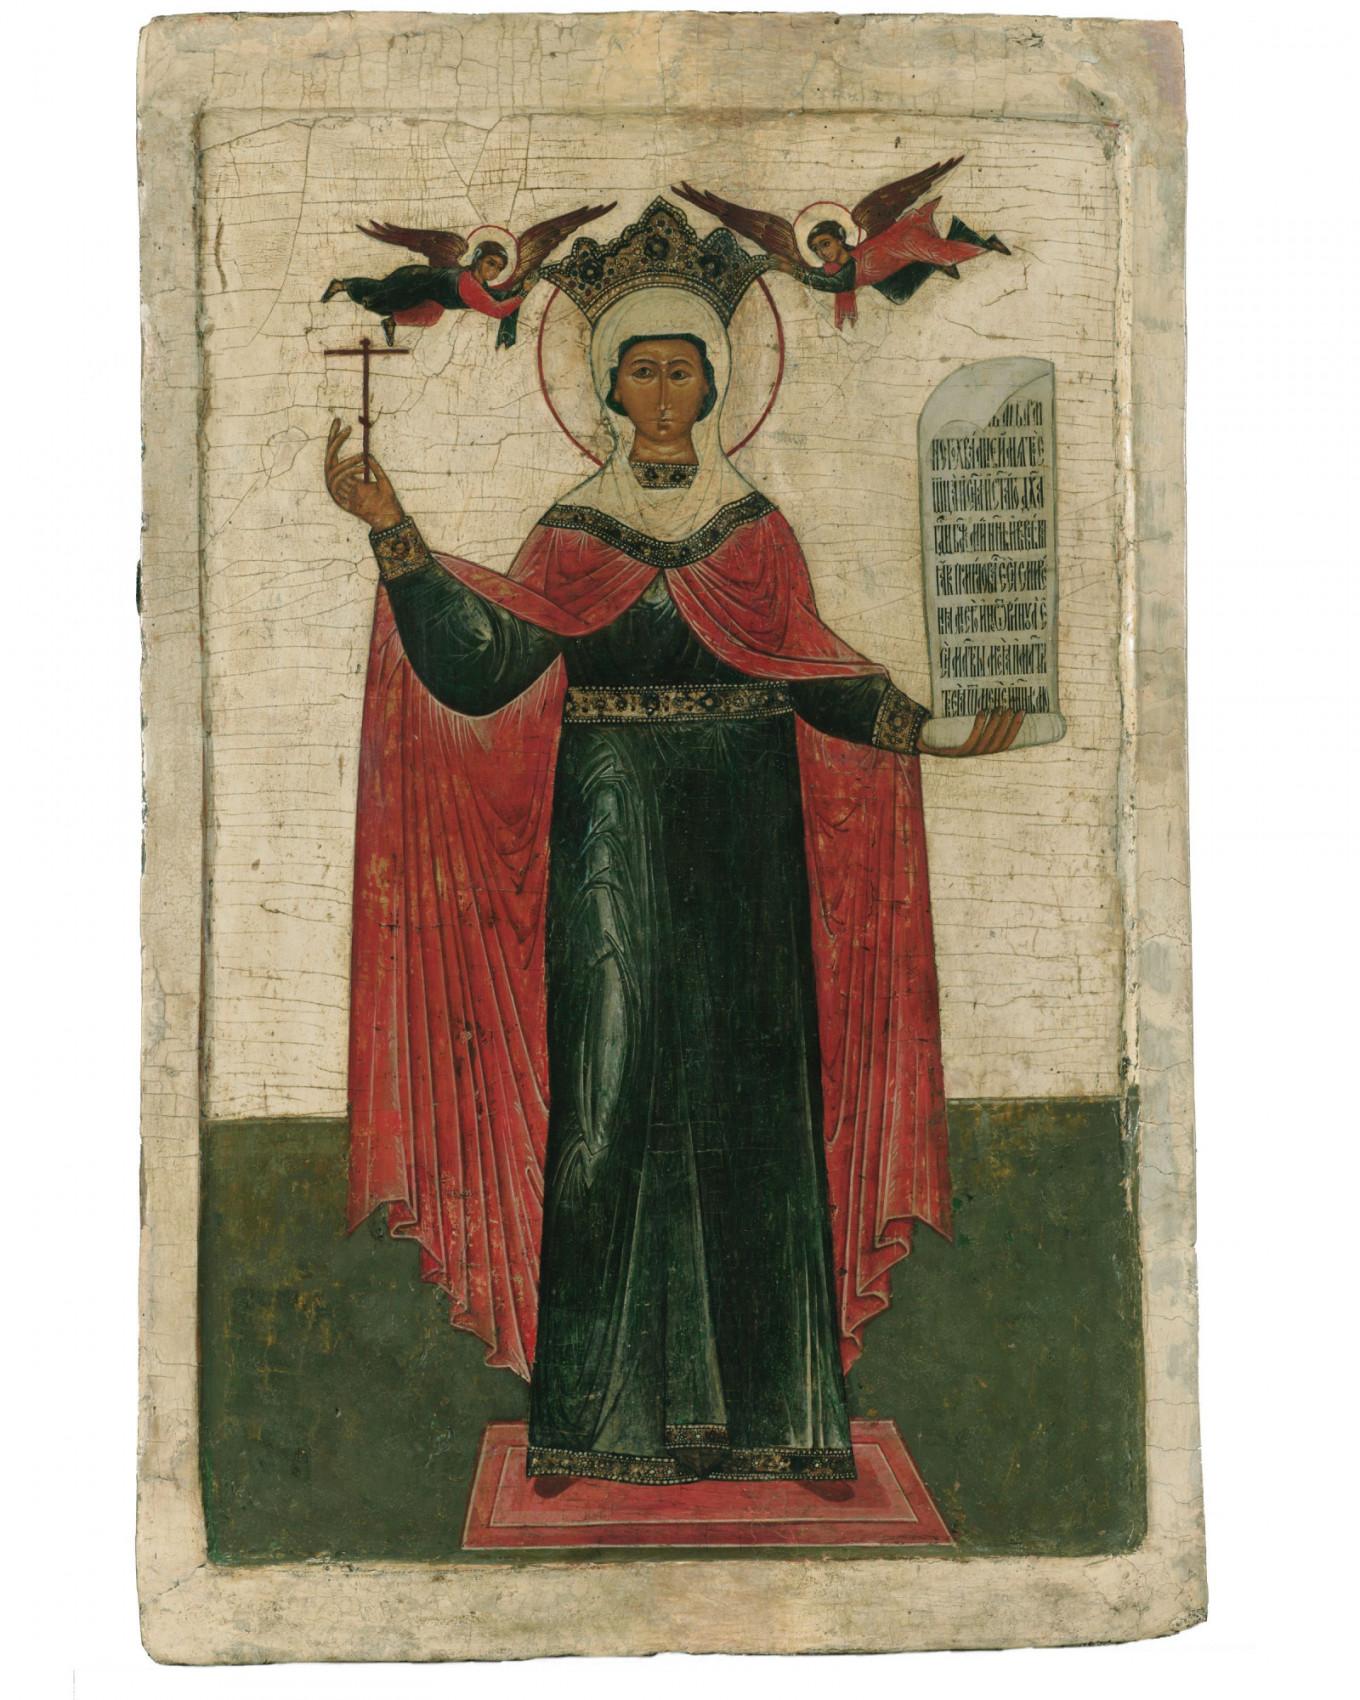 St. Paraskeva Museum of Russian Icons via Wikimedia Commons